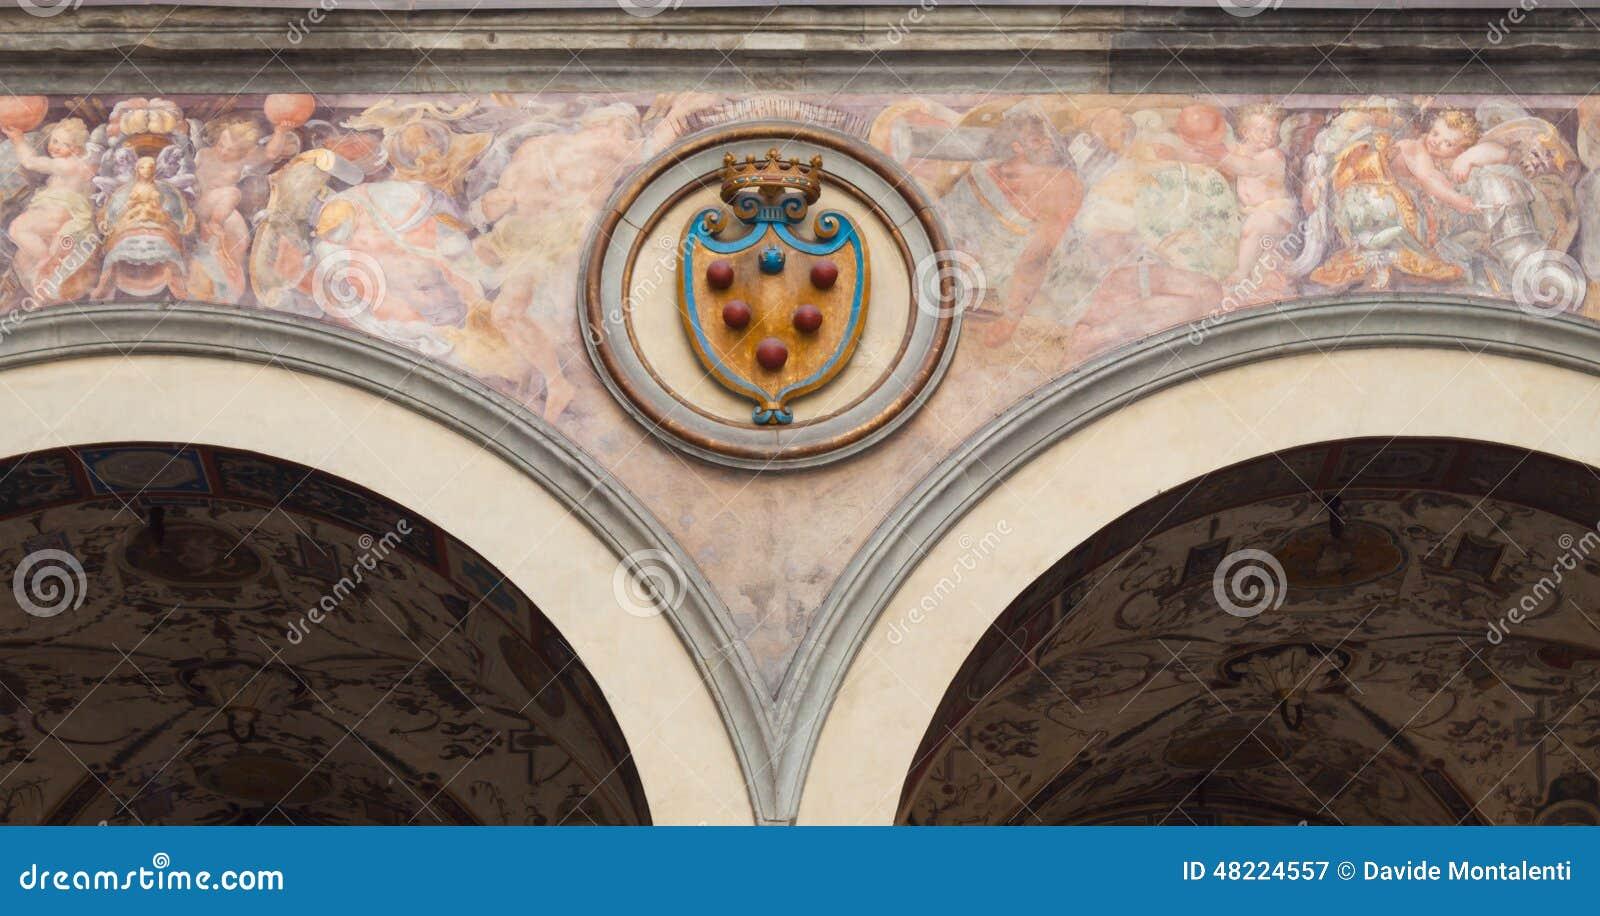 Medici emblem - Florence